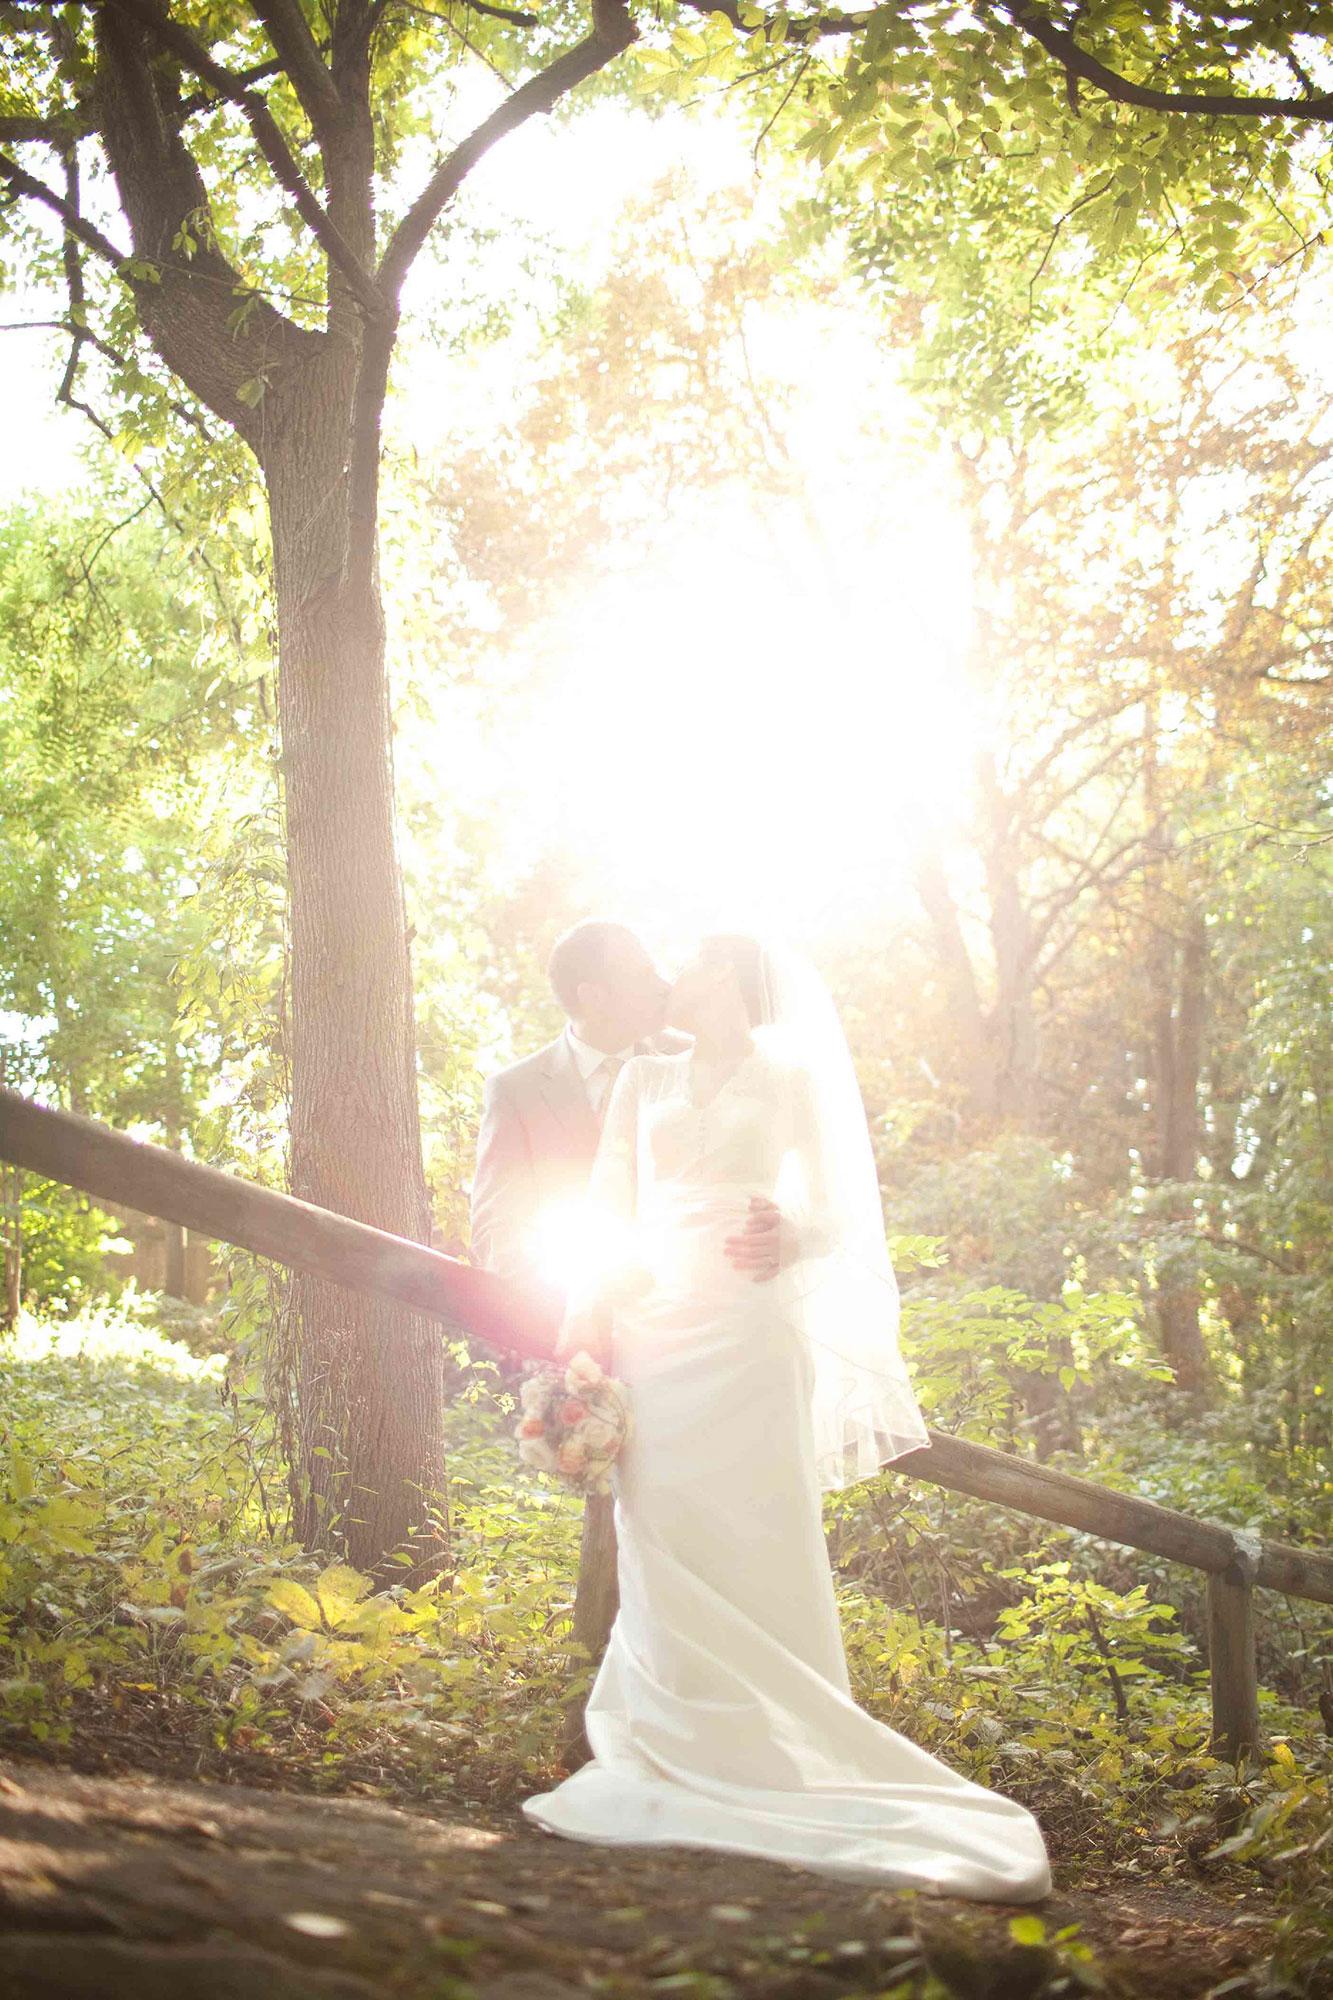 Amanda-Cowley-Willowbank-Vineyard-Bride-Photo-By-White-Photographie-038.jpg